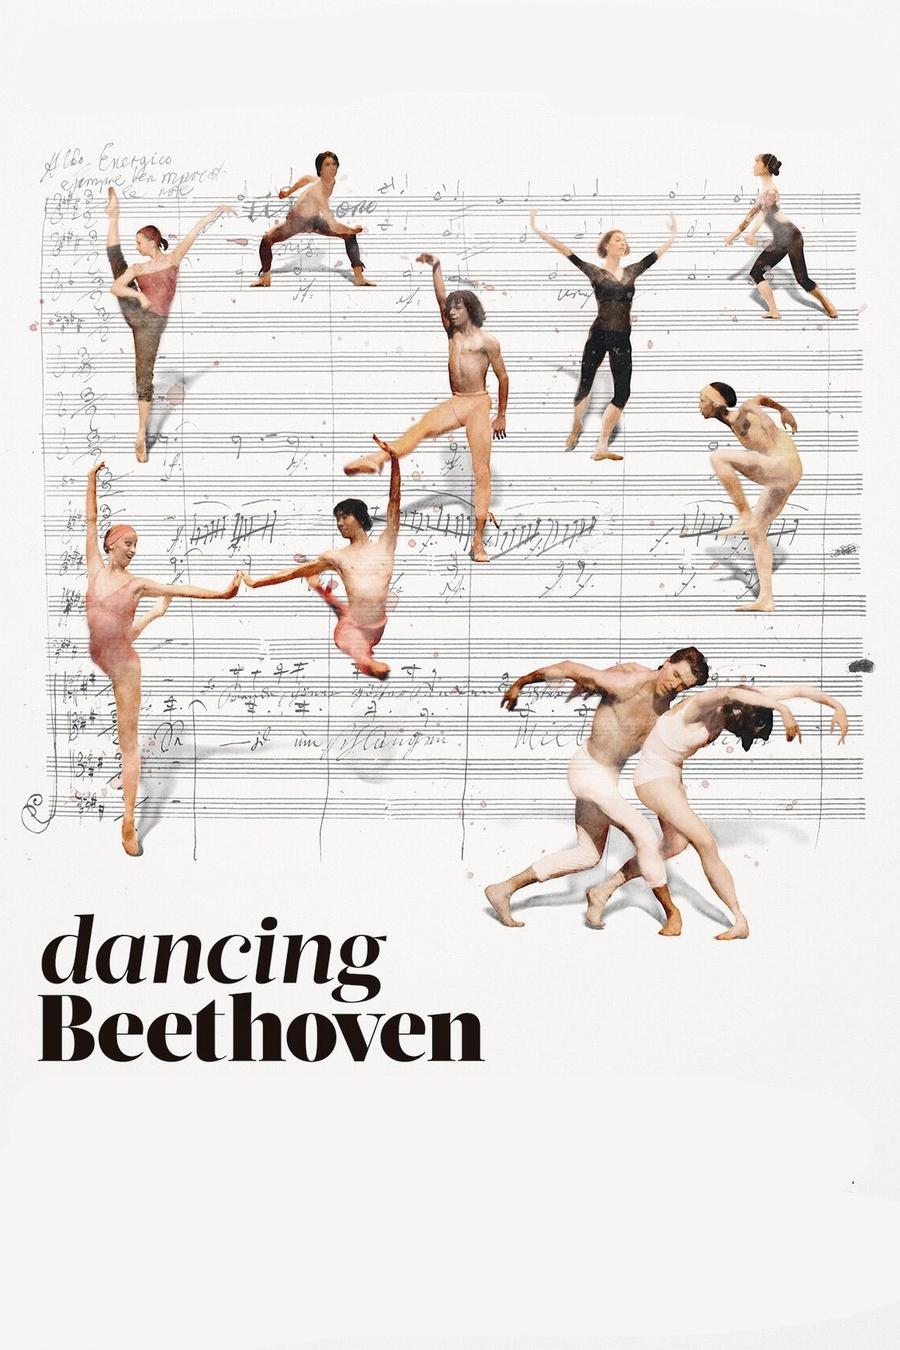 Dancing Beethoven